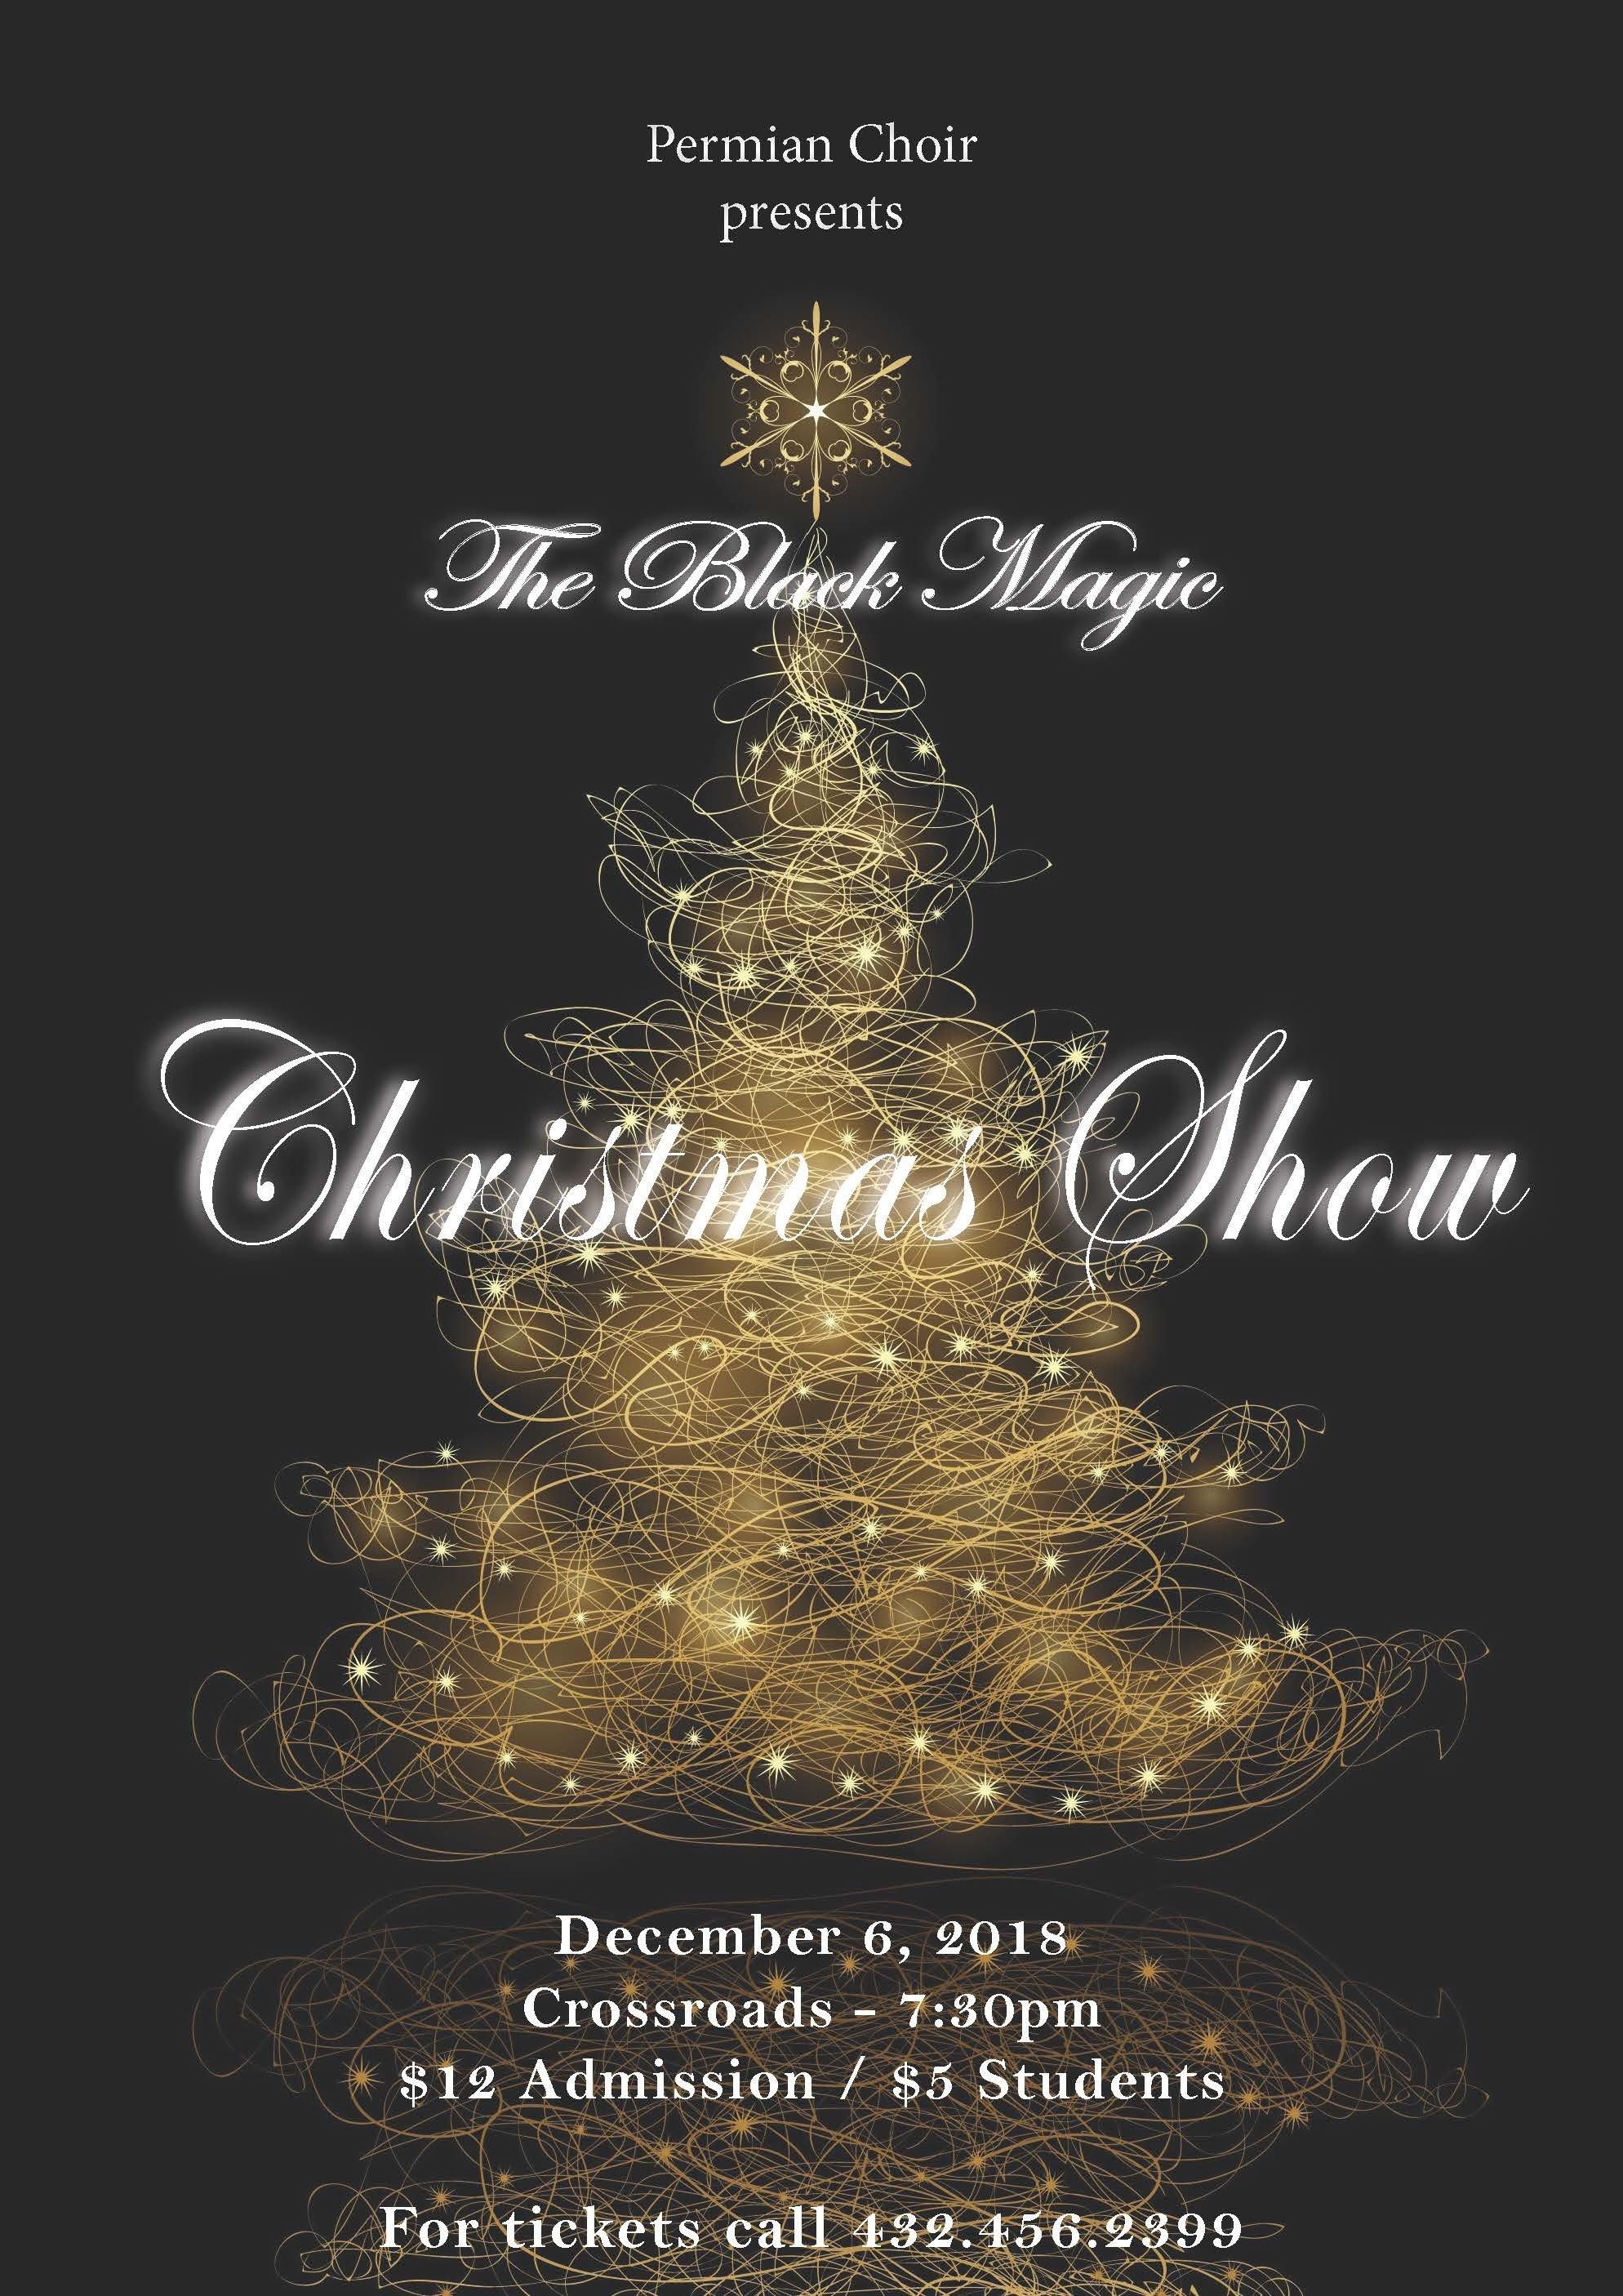 Black Magic Christmas Show - Student Ticket 00027